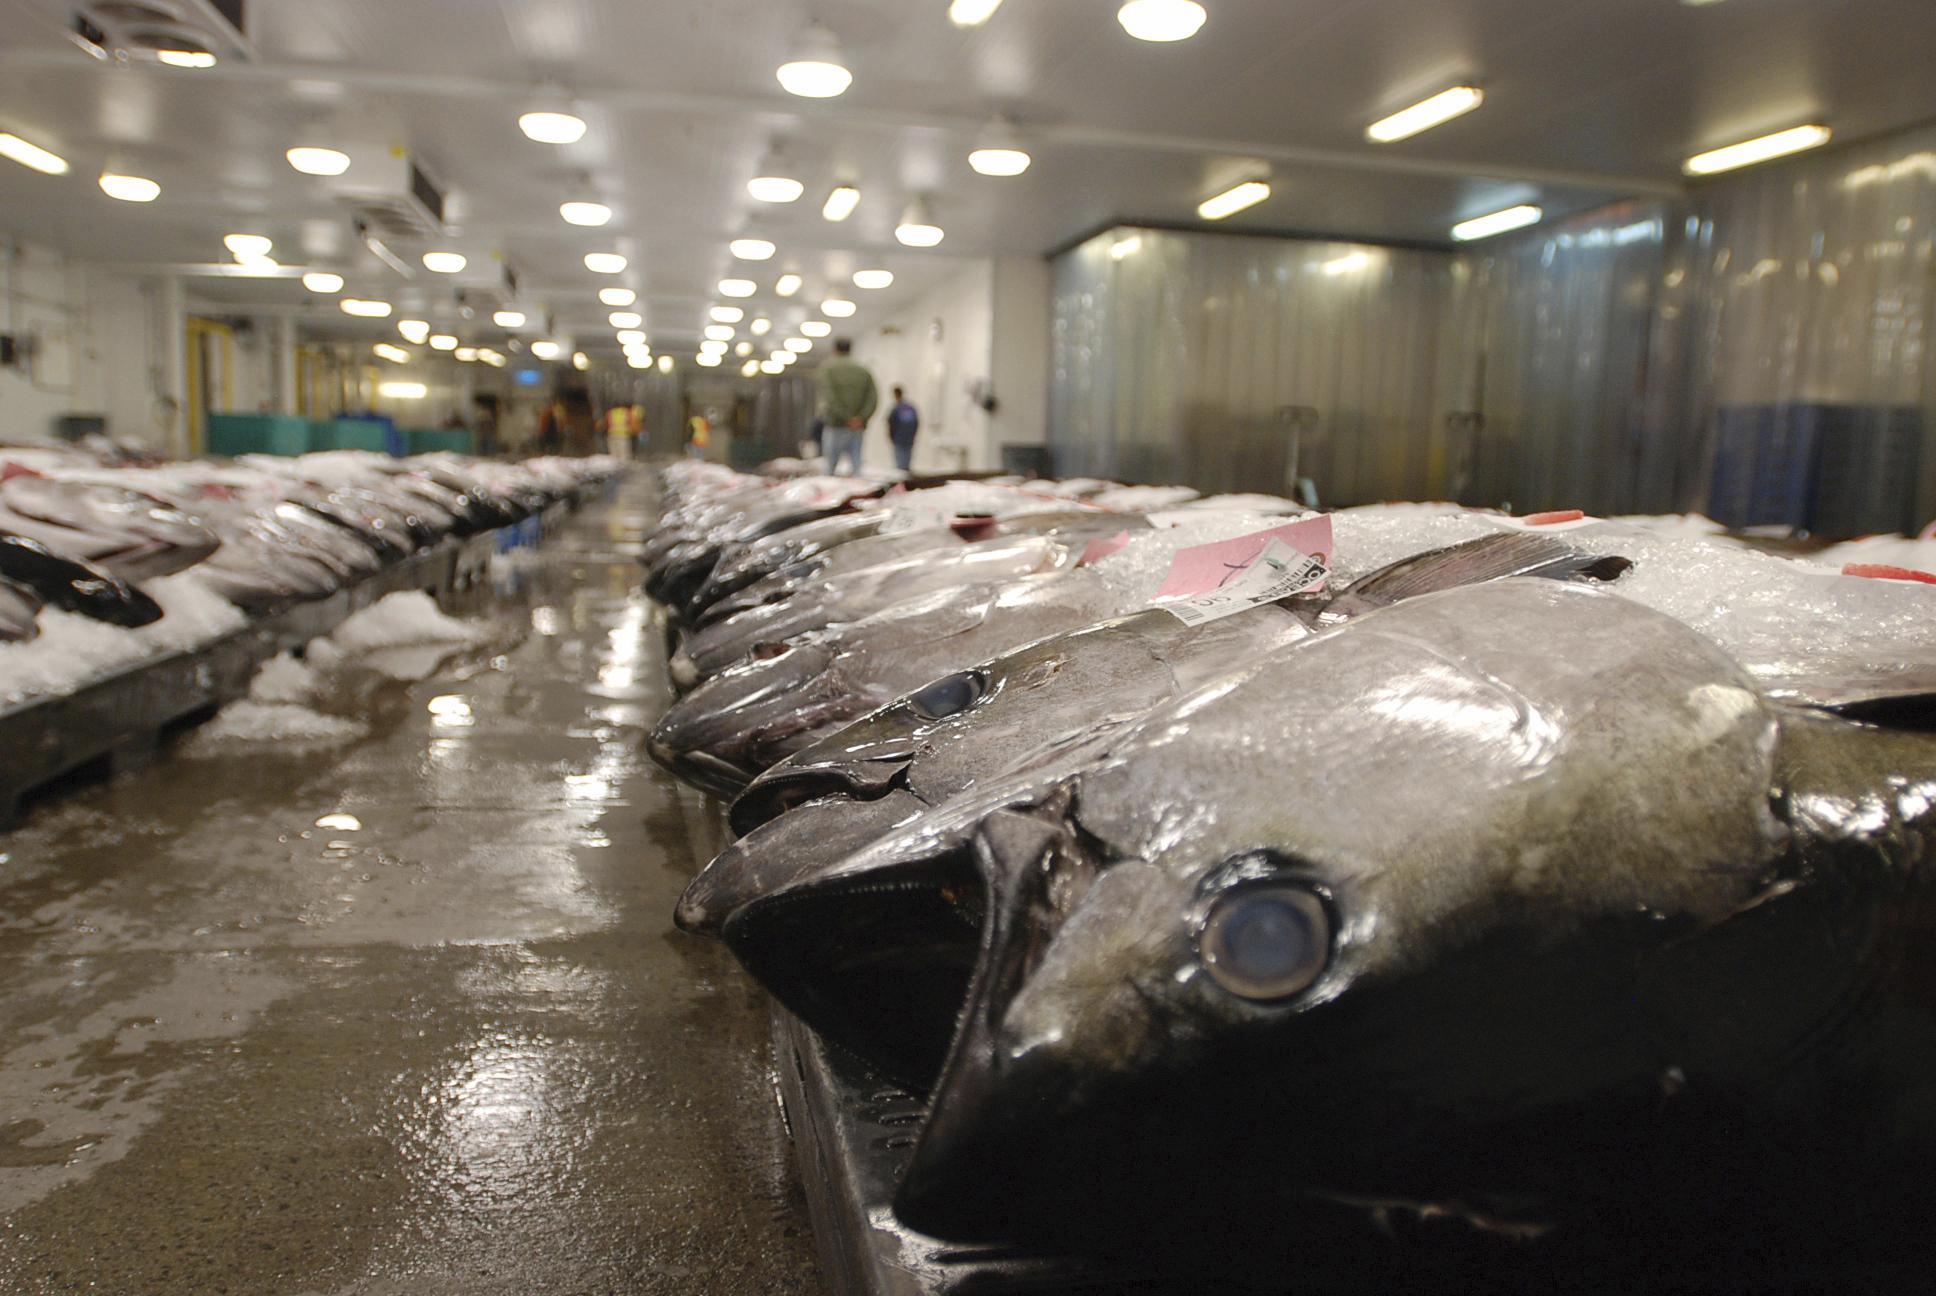 apnews.com: US blocks seafood from Fiji ship accused of enslaving crew